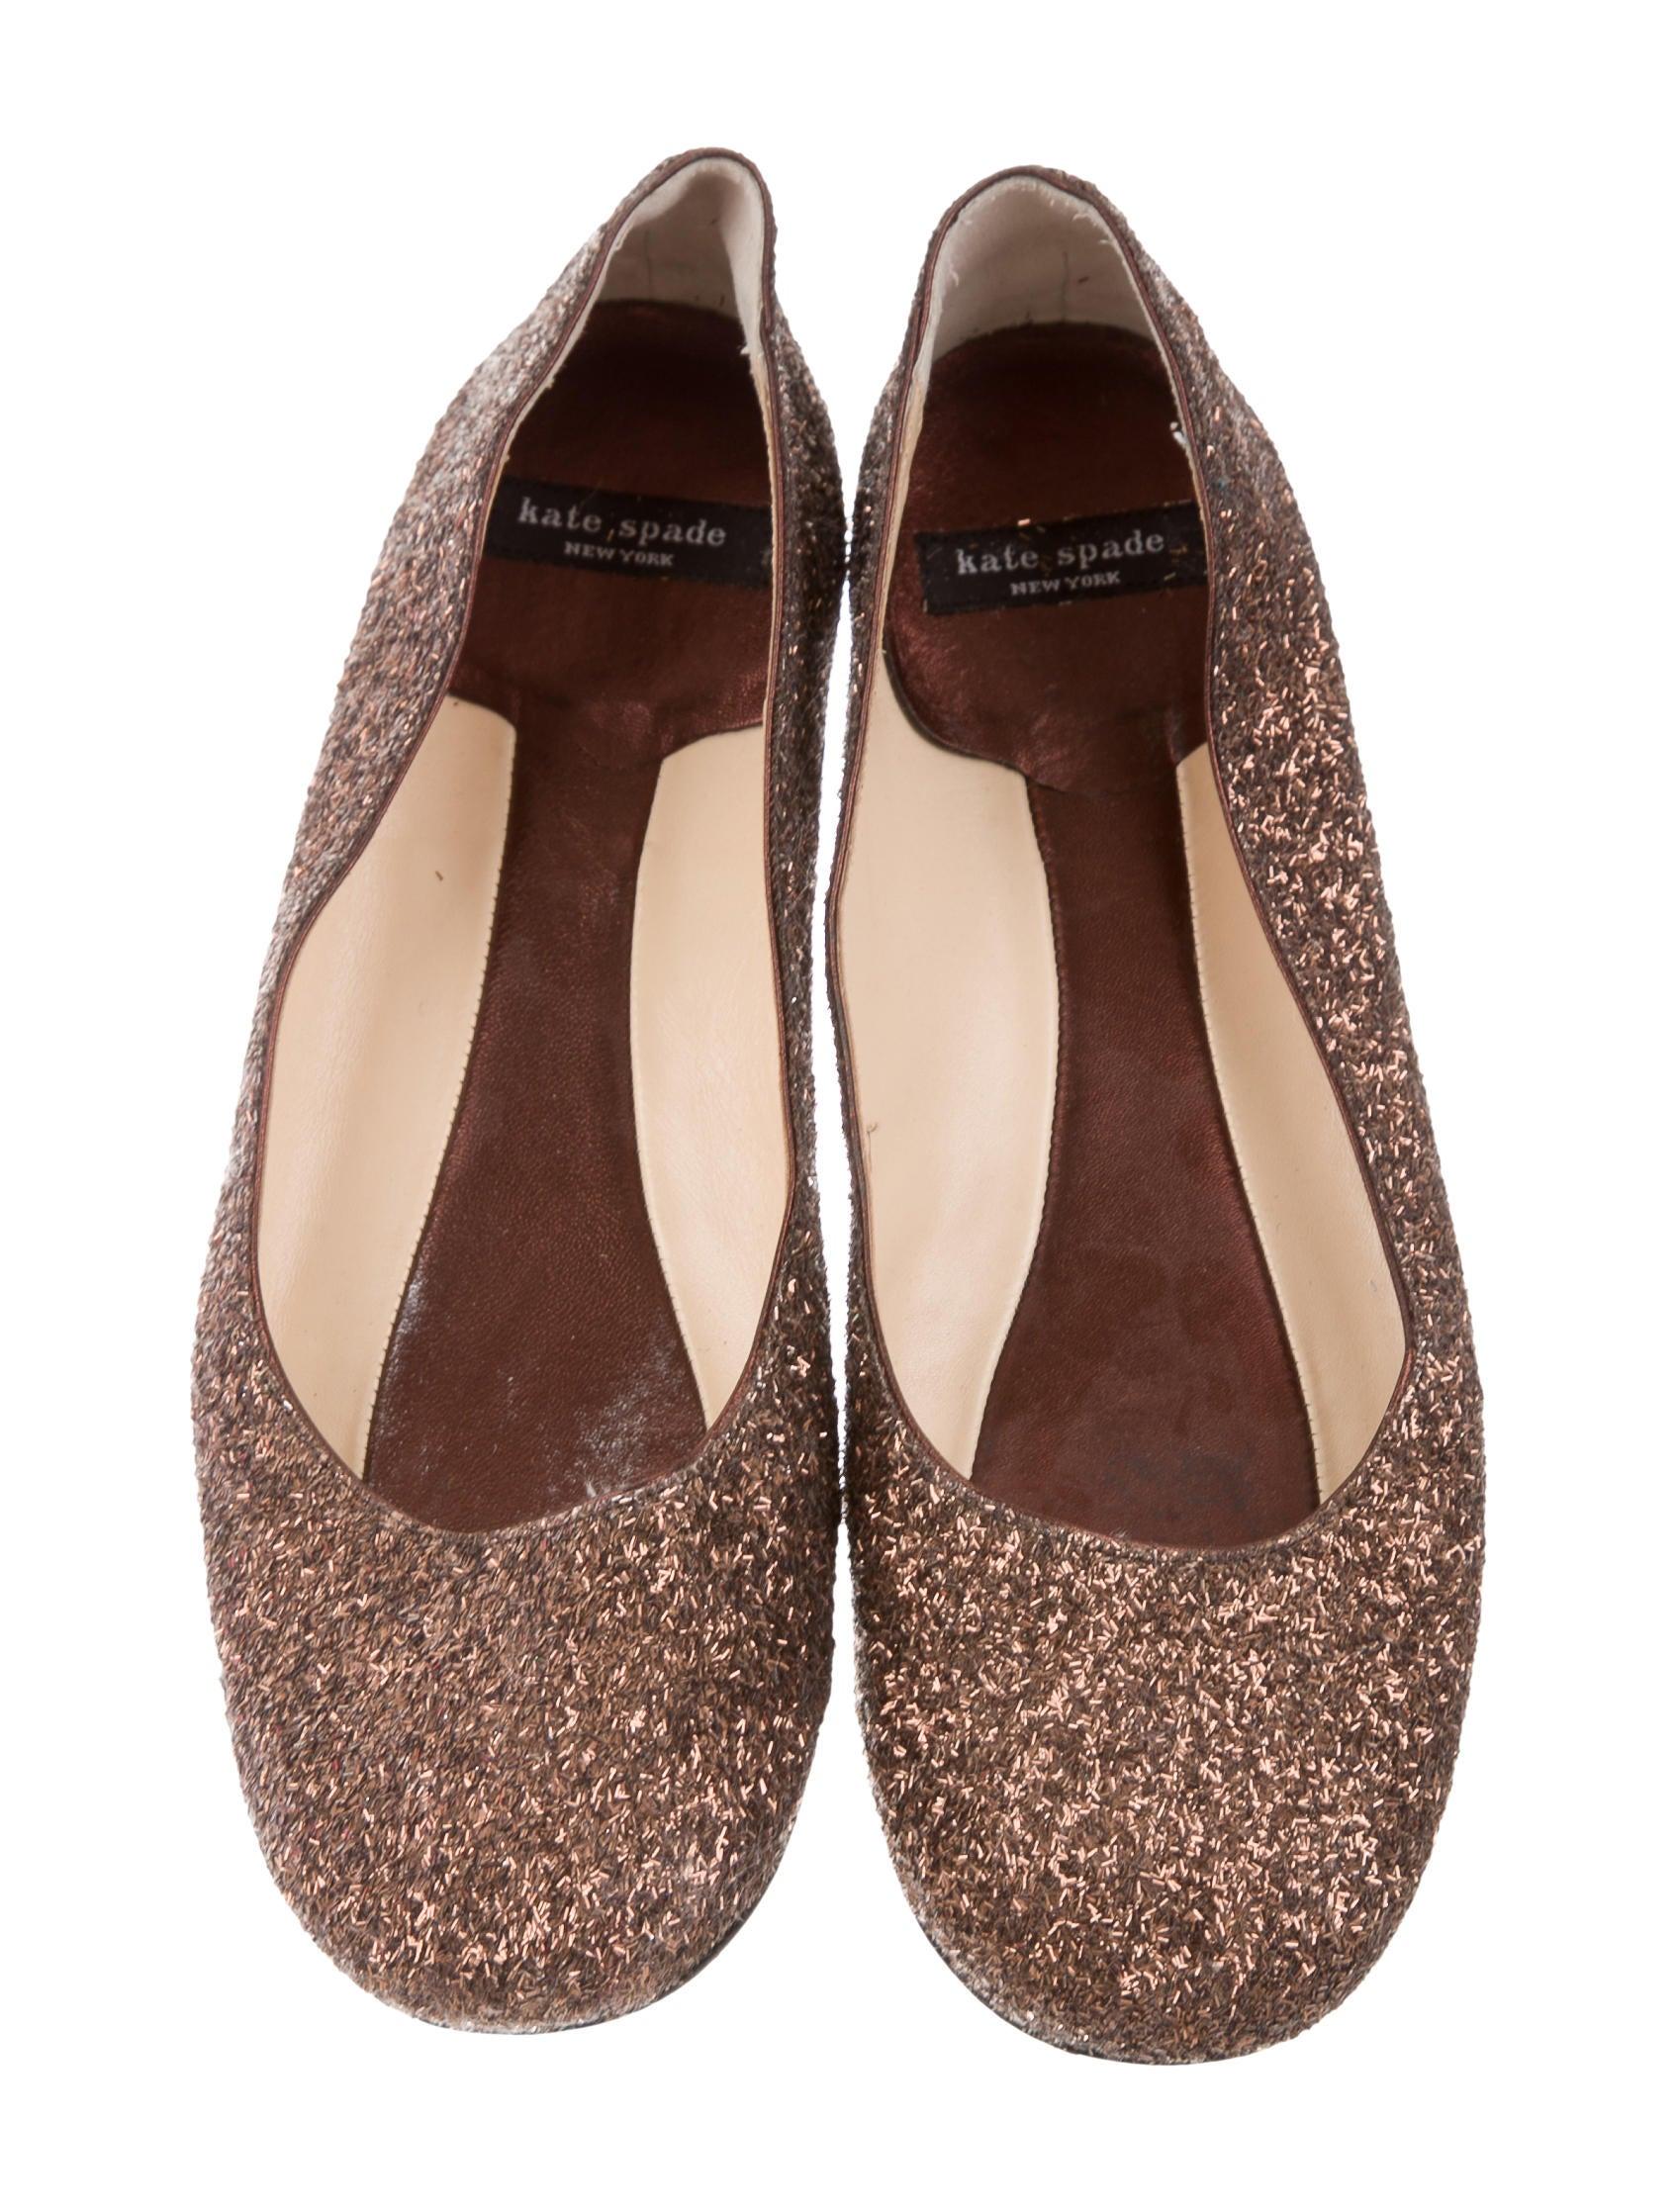 Kate spade new york glitter round toe flats shoes for Kate spade new york flats